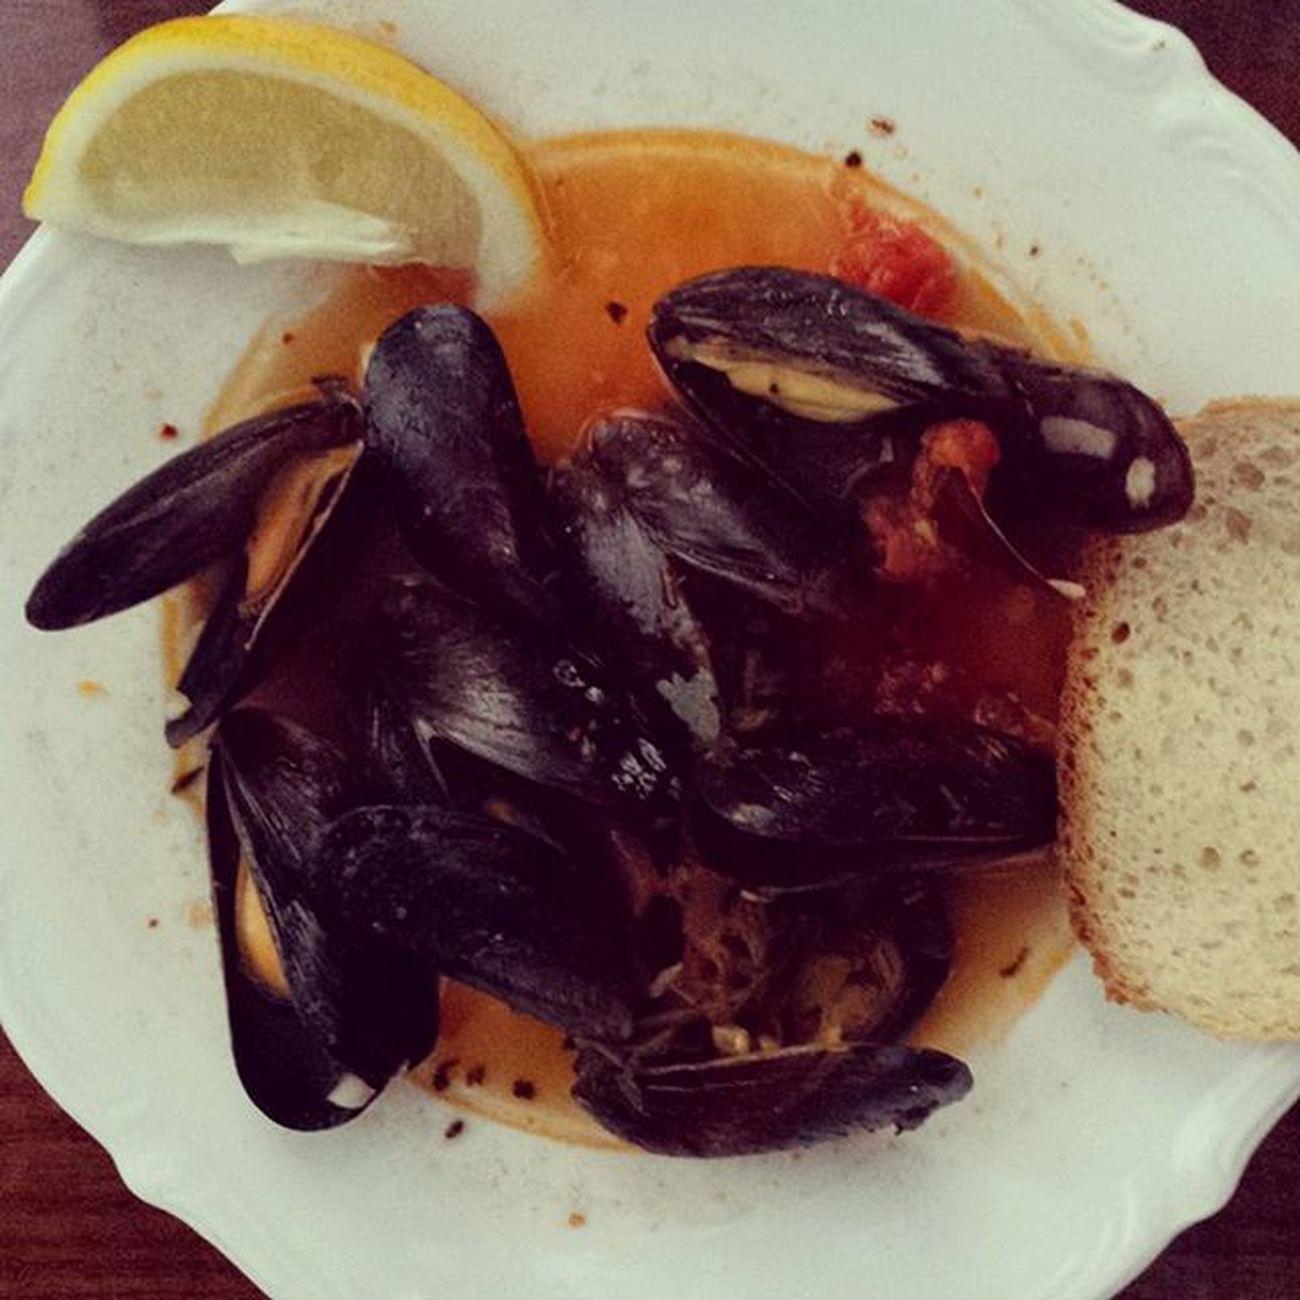 Deliciosa za 9,99zł z Biedronki http://grykuchenne.pl/swieze-mule-chili-czosnek-pomidory/ Mule Seafood Foodmania Foodie Palcelizac Muszle Bluemussel Mussels